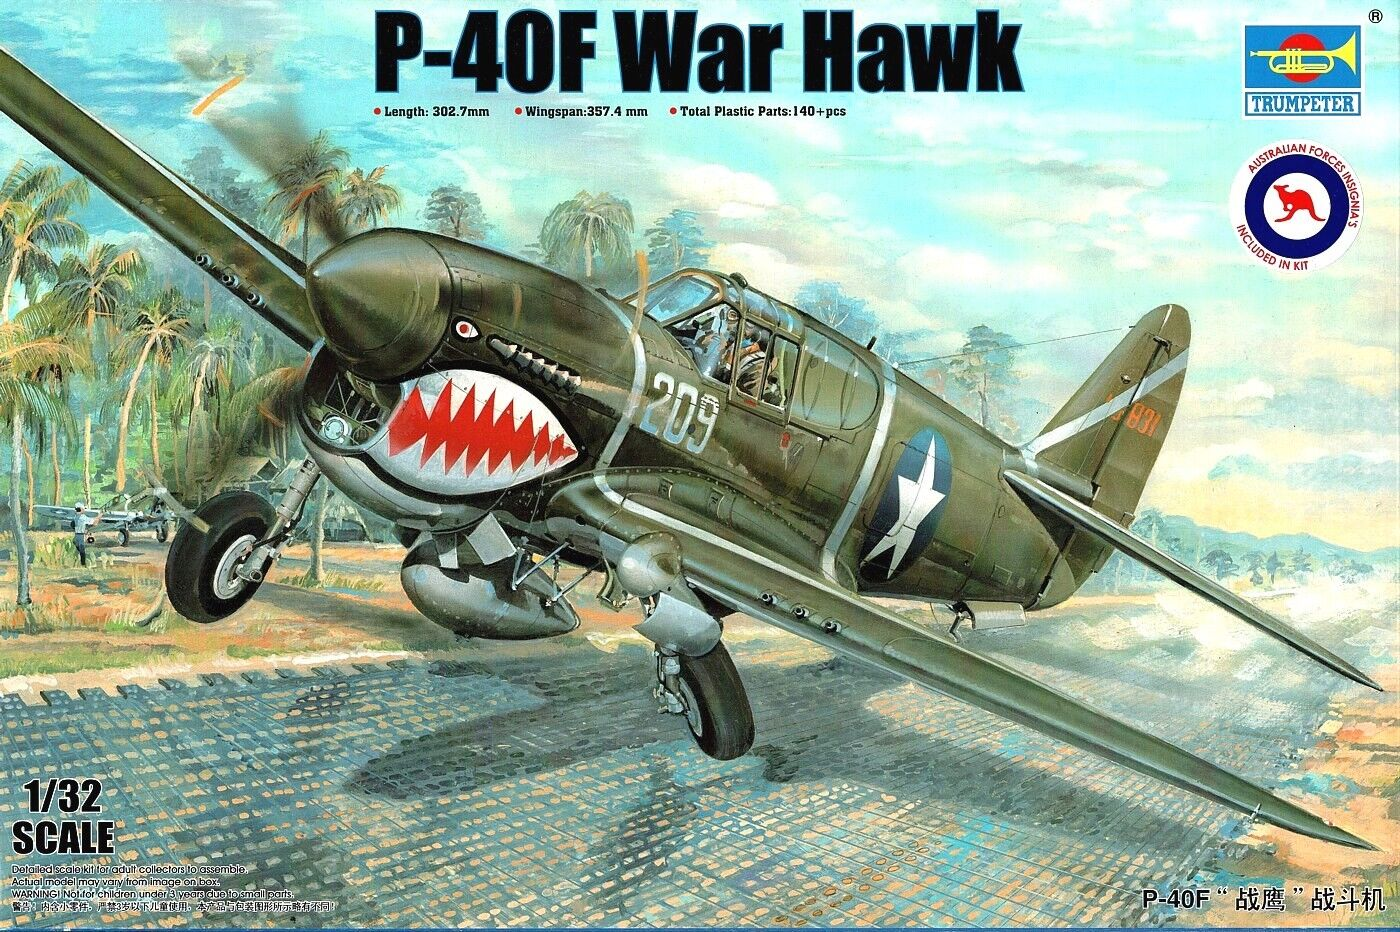 1 32 TRUMPETER 03227; Curtiss P-40F Warhawk USAAF   Kittyhawk II 3 SQN RAAF